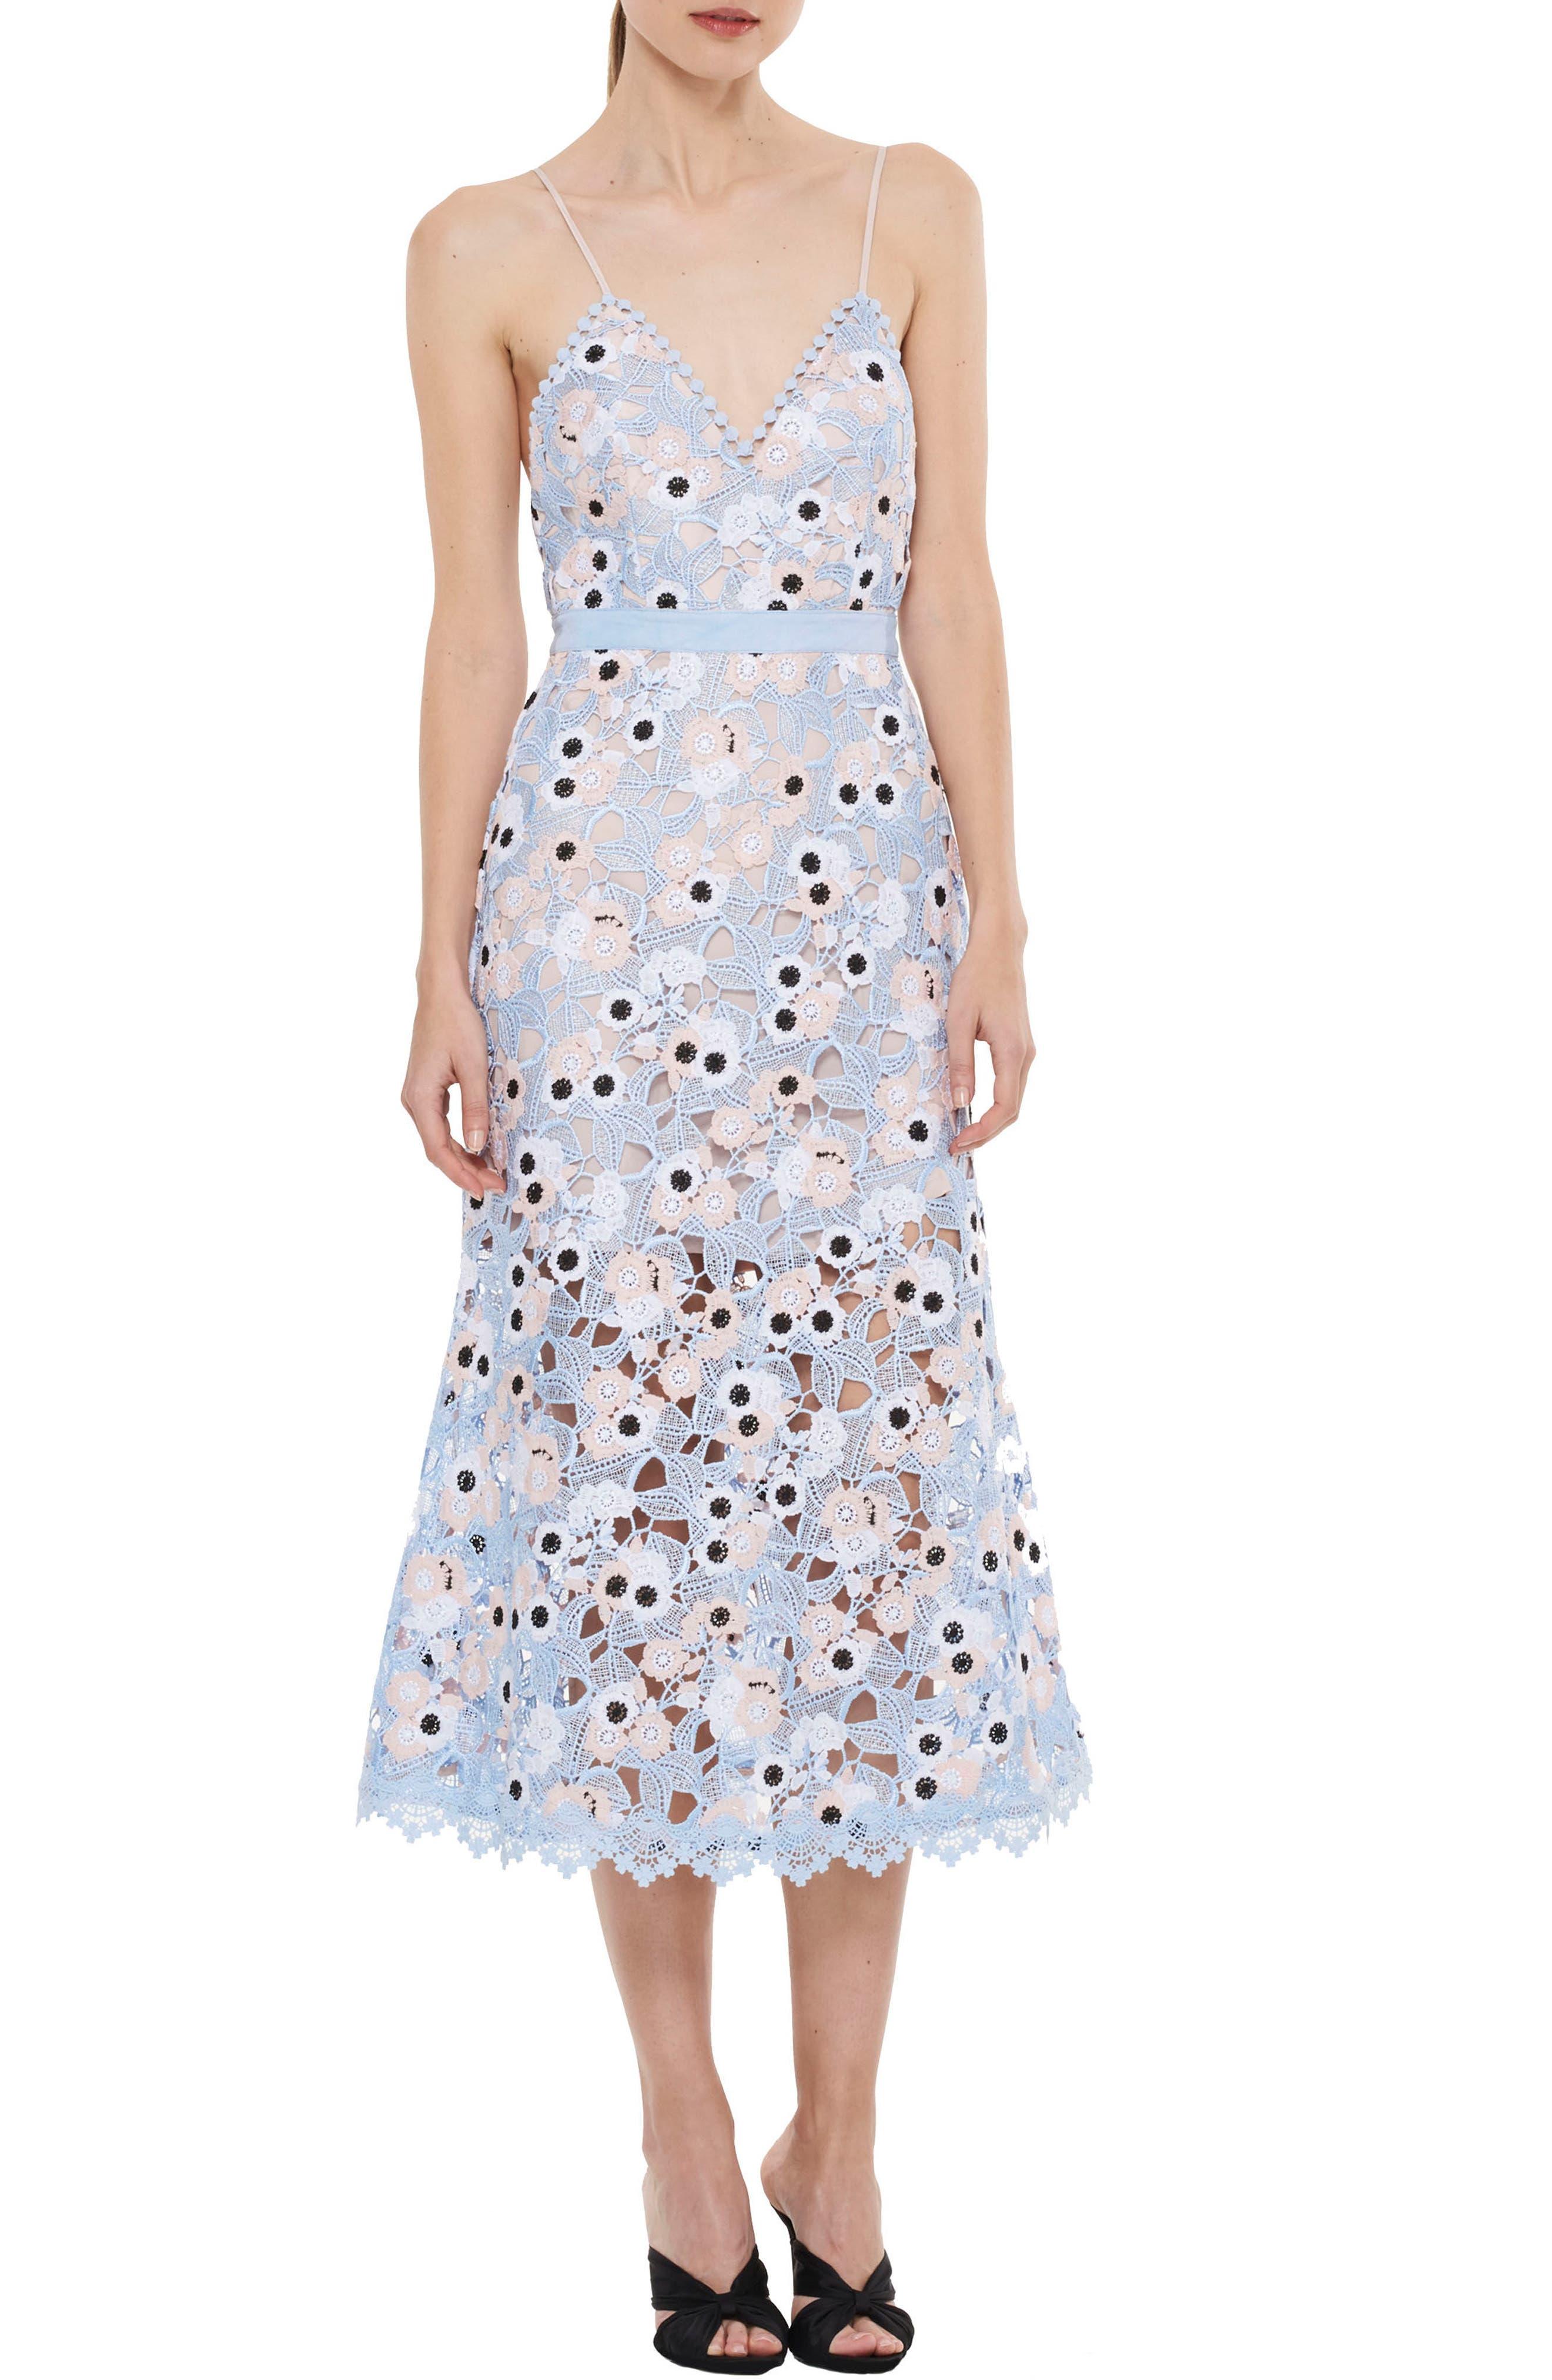 Main Image - LA MAISON TALULAH Infatuation Crochet A-Line Dress